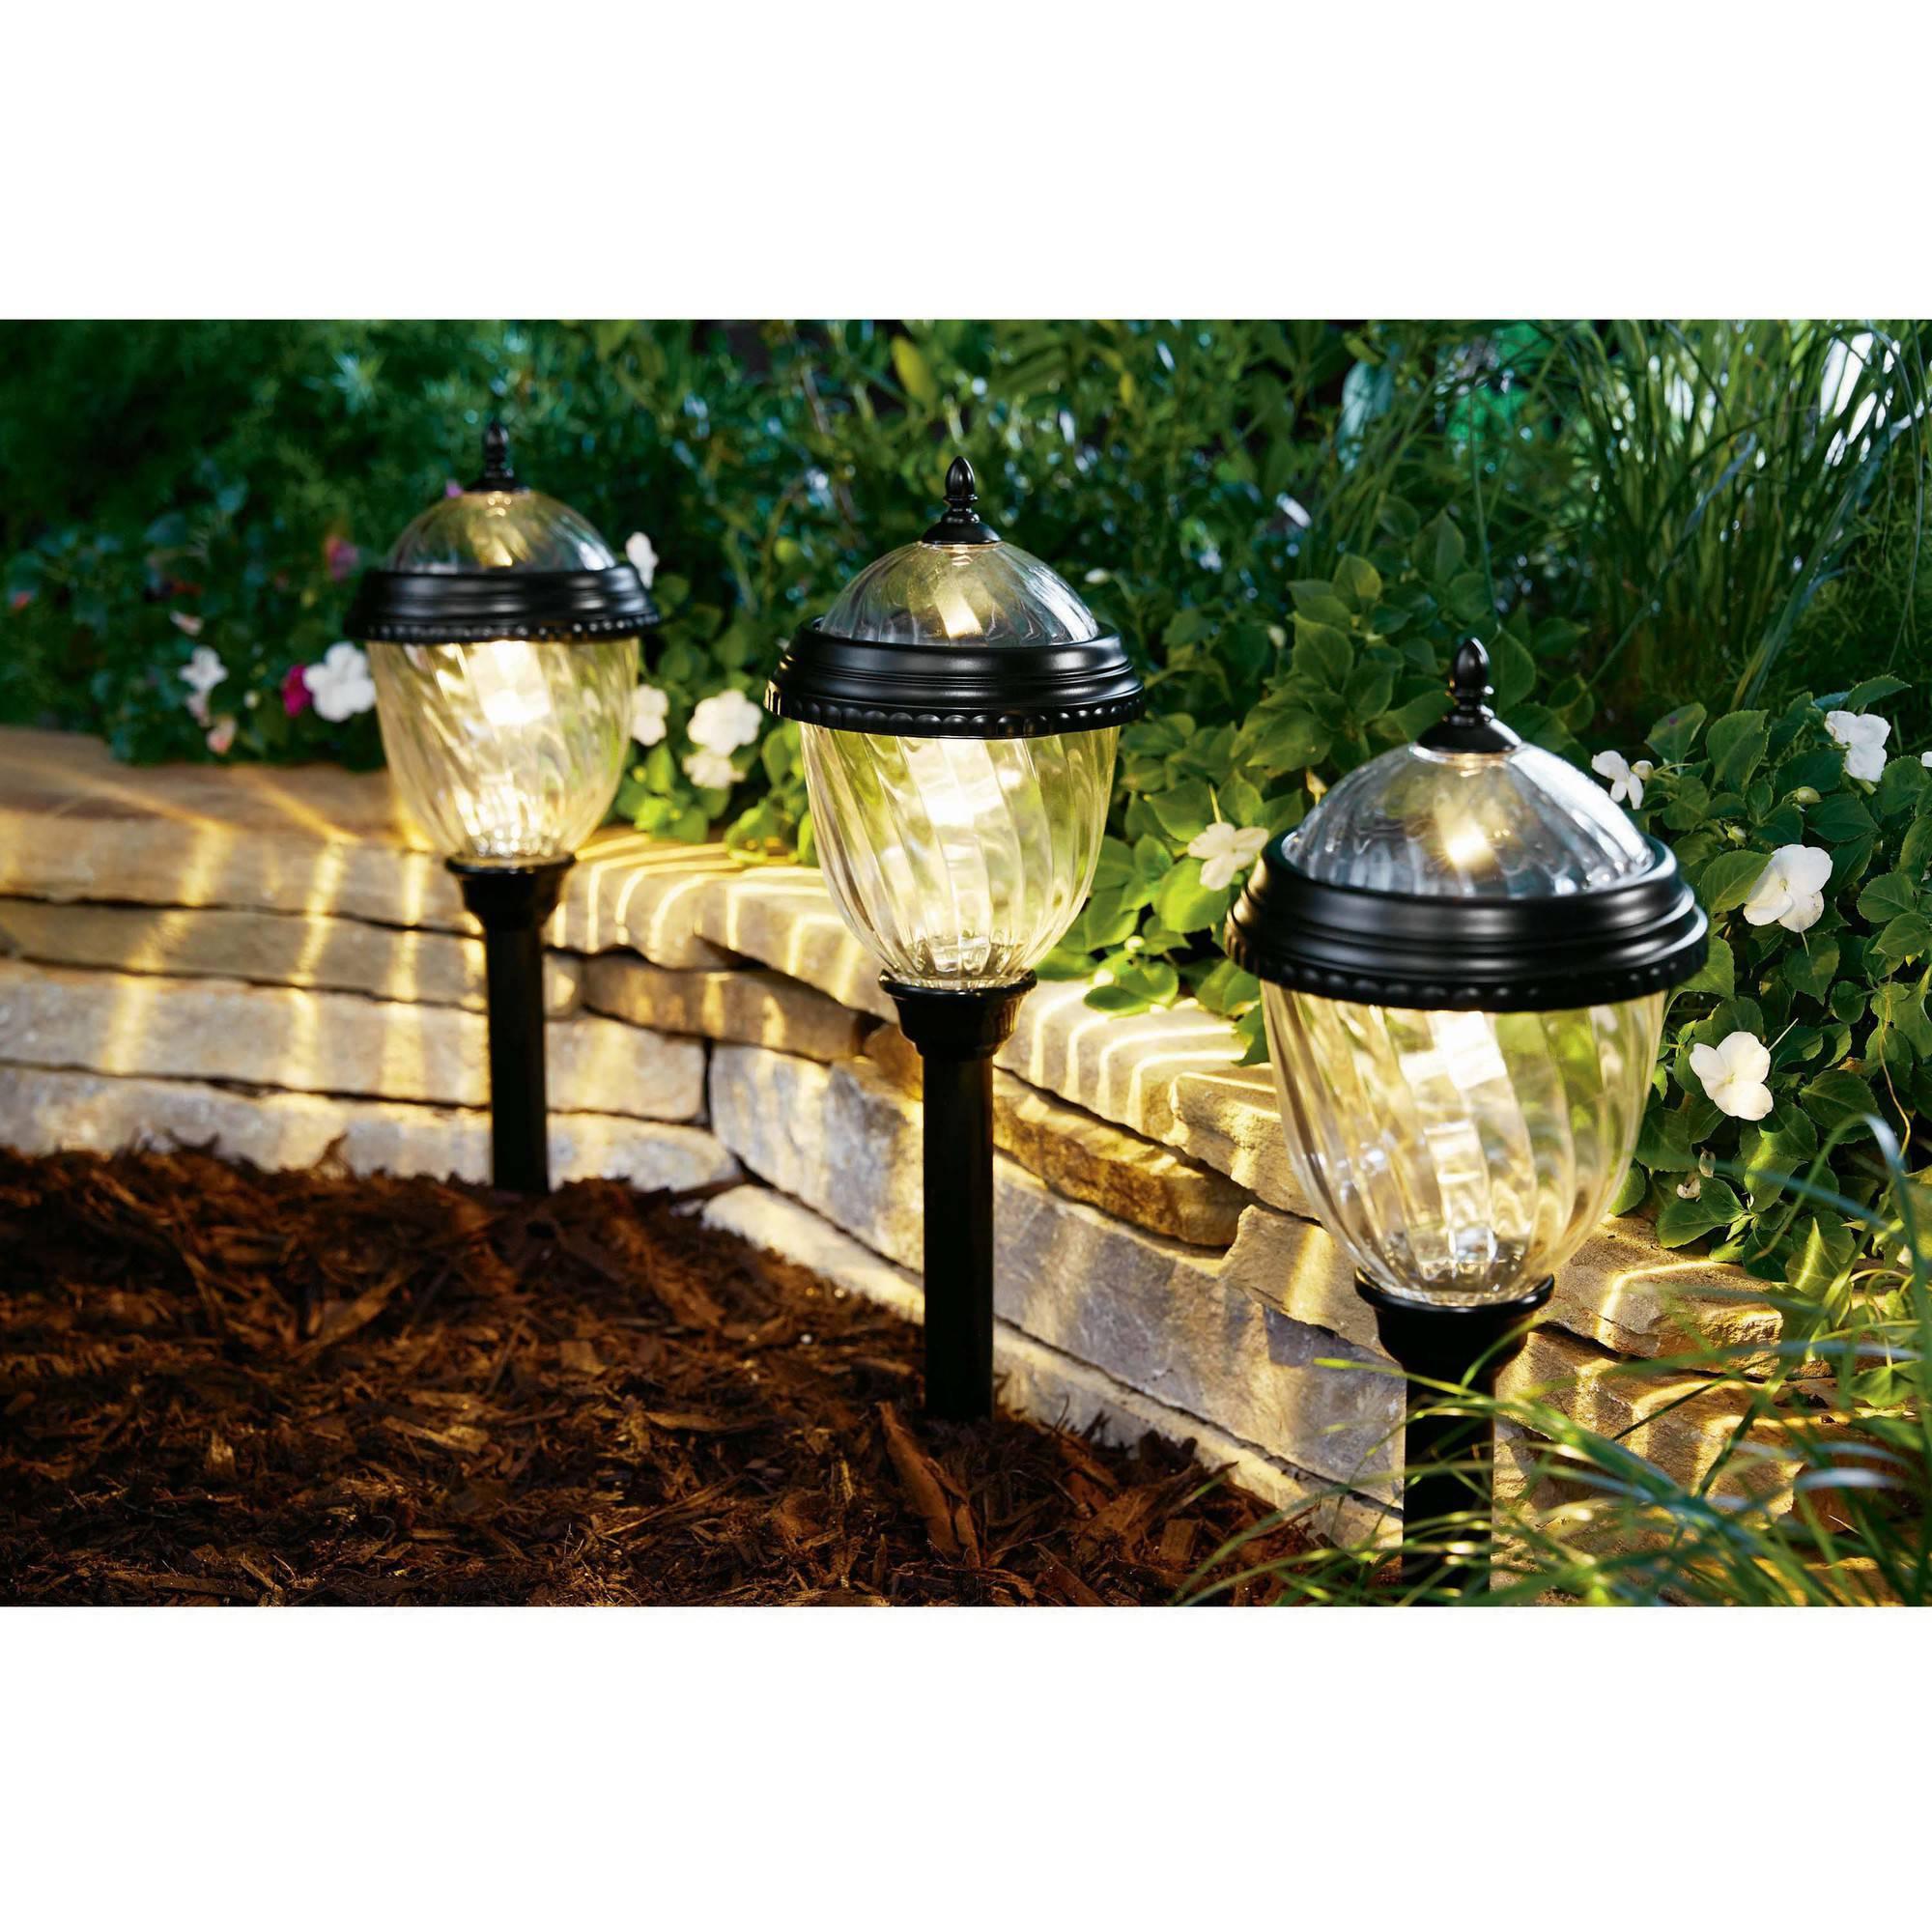 Better Homes and Gardens Castlewood Solar-Powered Landscape Light